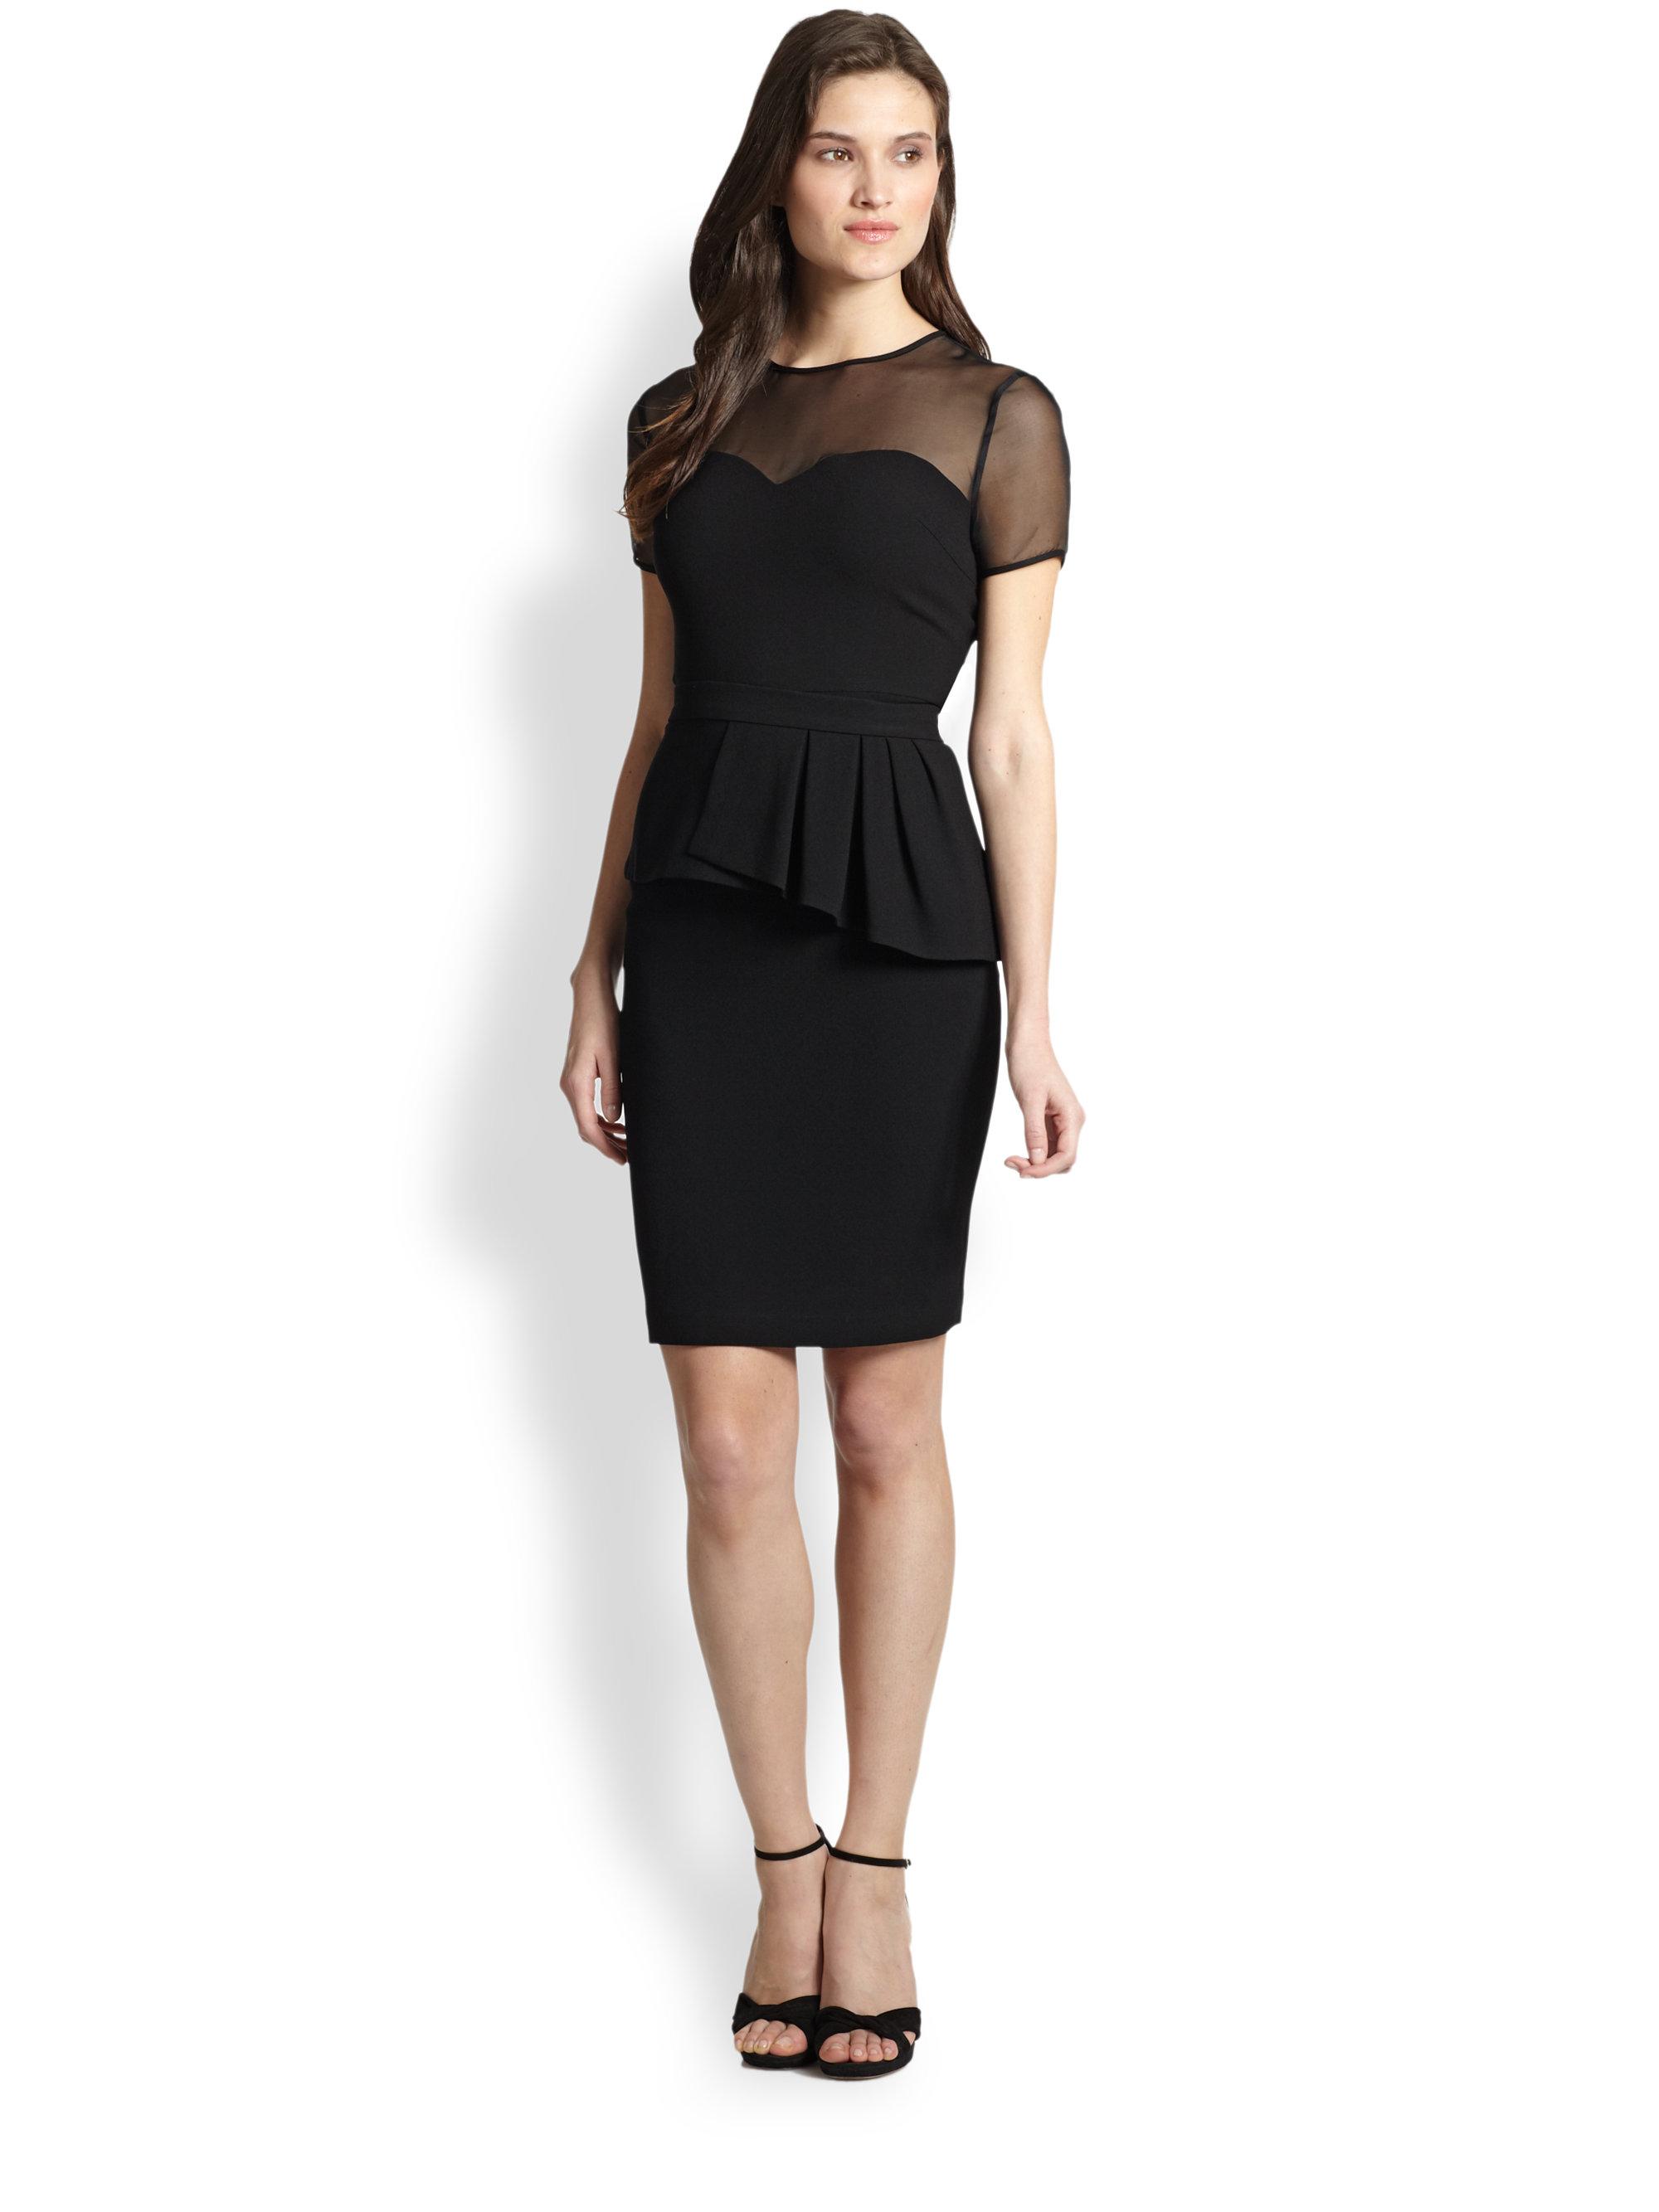 Elie Tahari Sheer Bodice Back Peplum Dress In Black Lyst